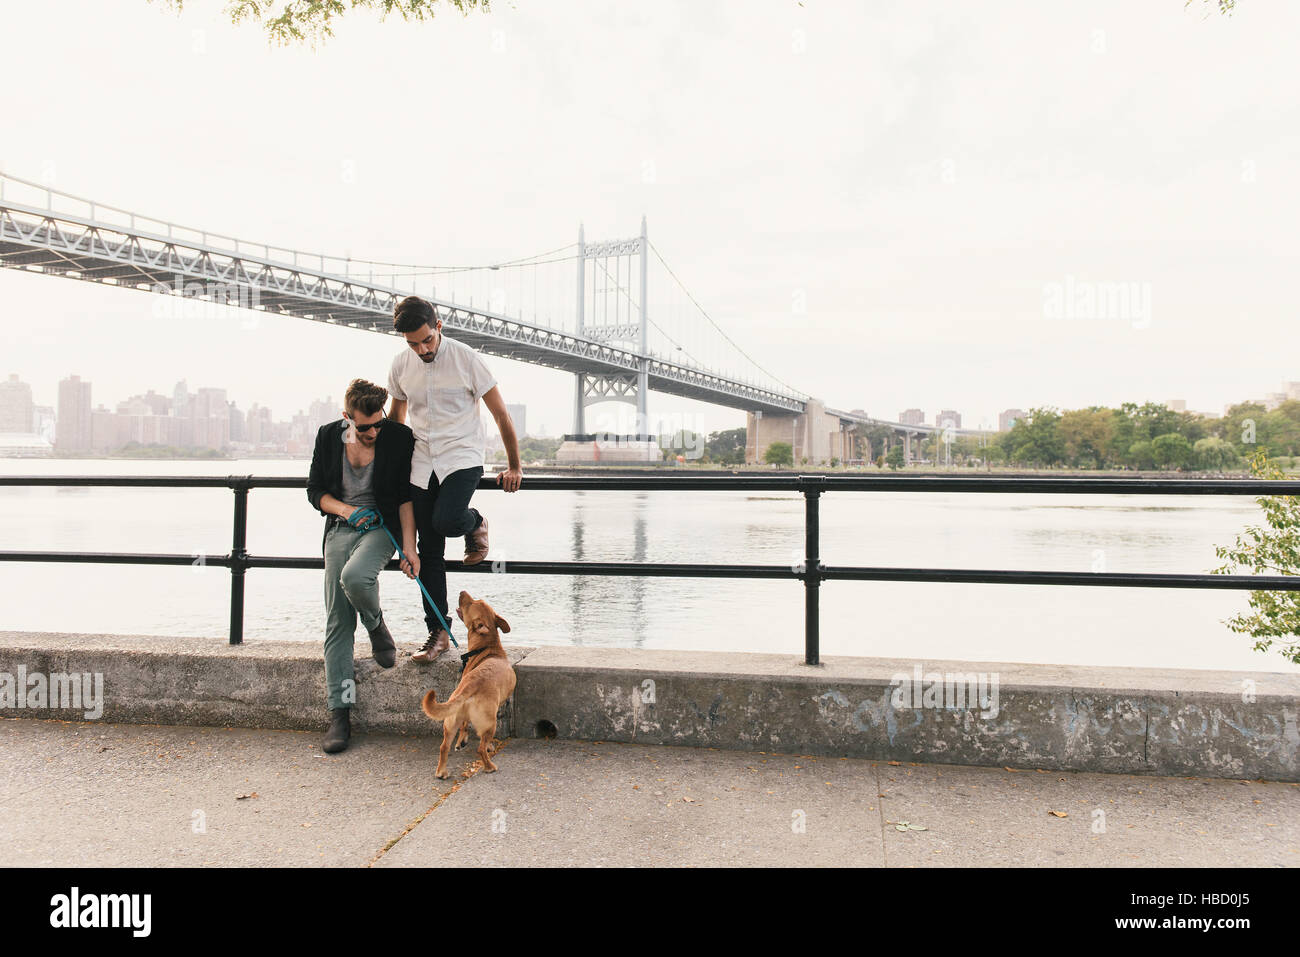 Joven pareja masculina en Riverside mirando perro, Astoria, Nueva York, EE.UU. Imagen De Stock